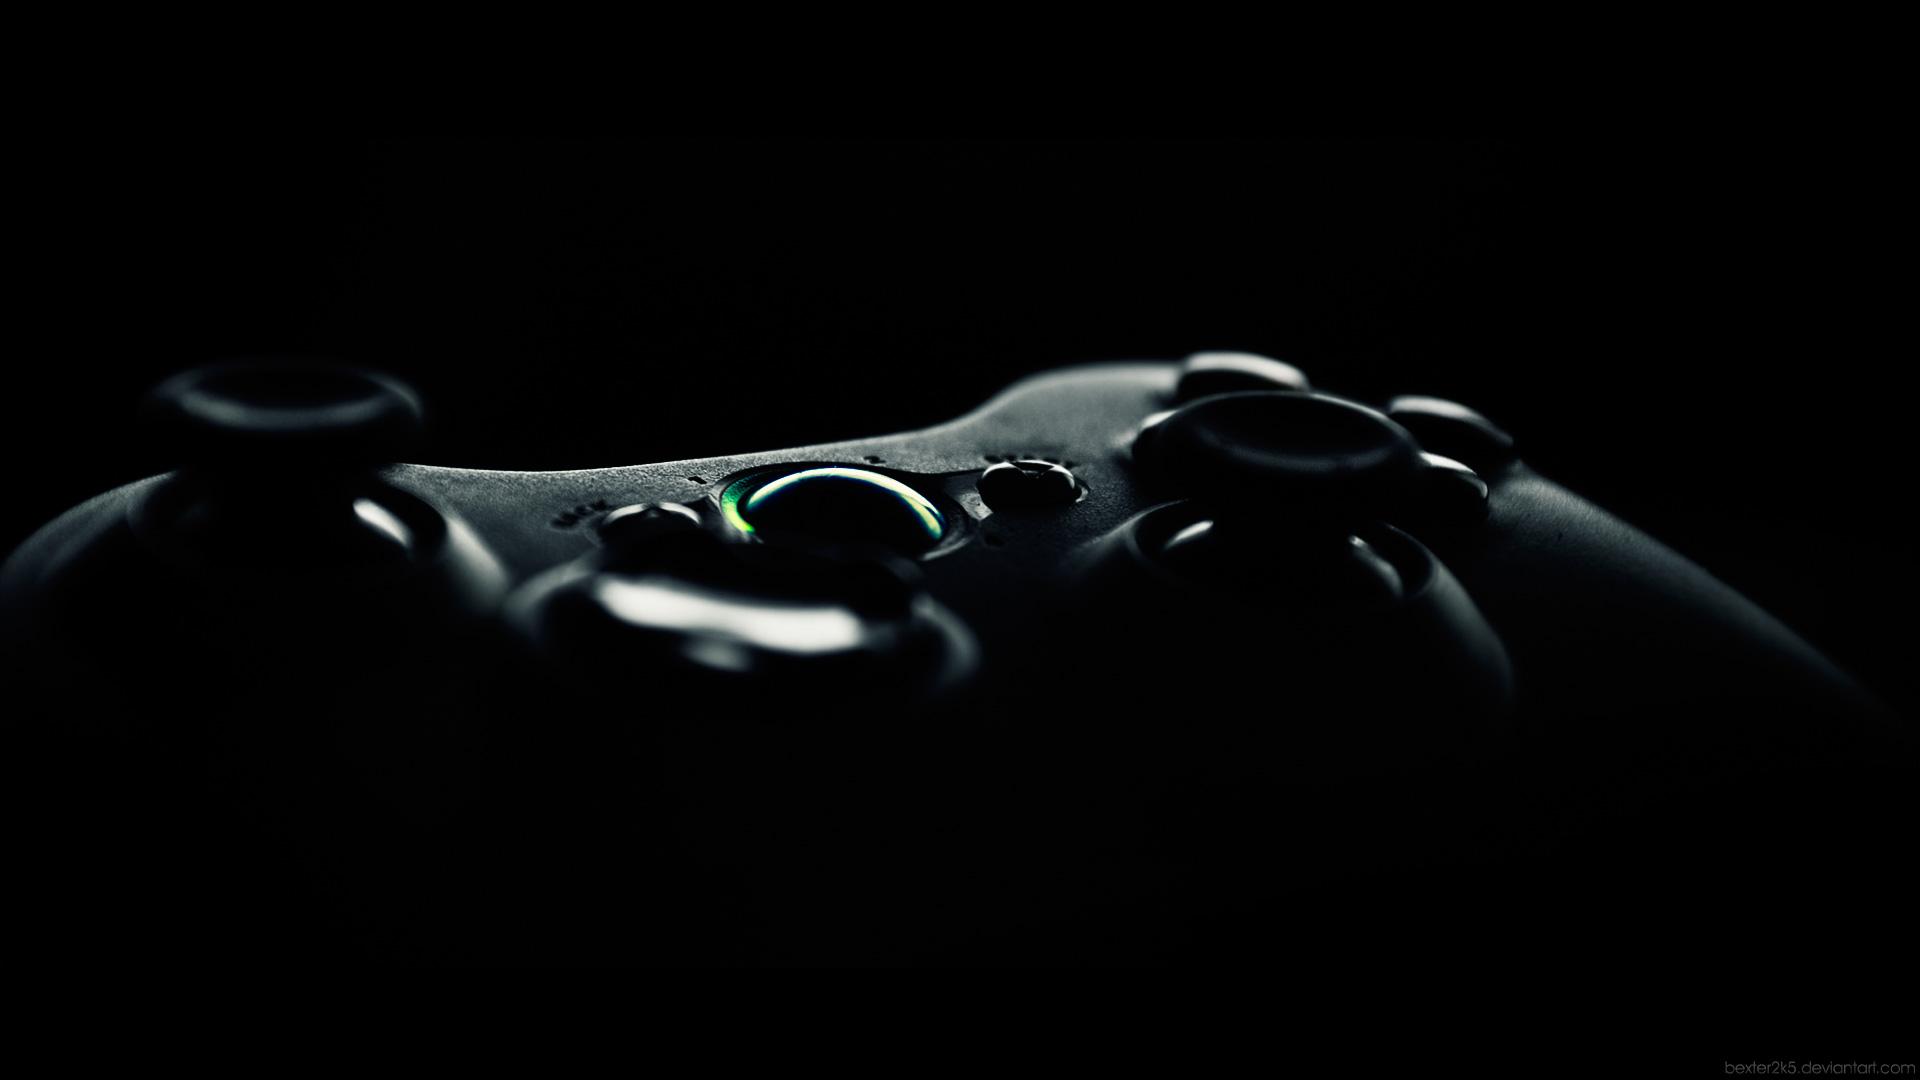 Fonds dcran Xbox 360 tous les wallpapers Xbox 360 1920x1080